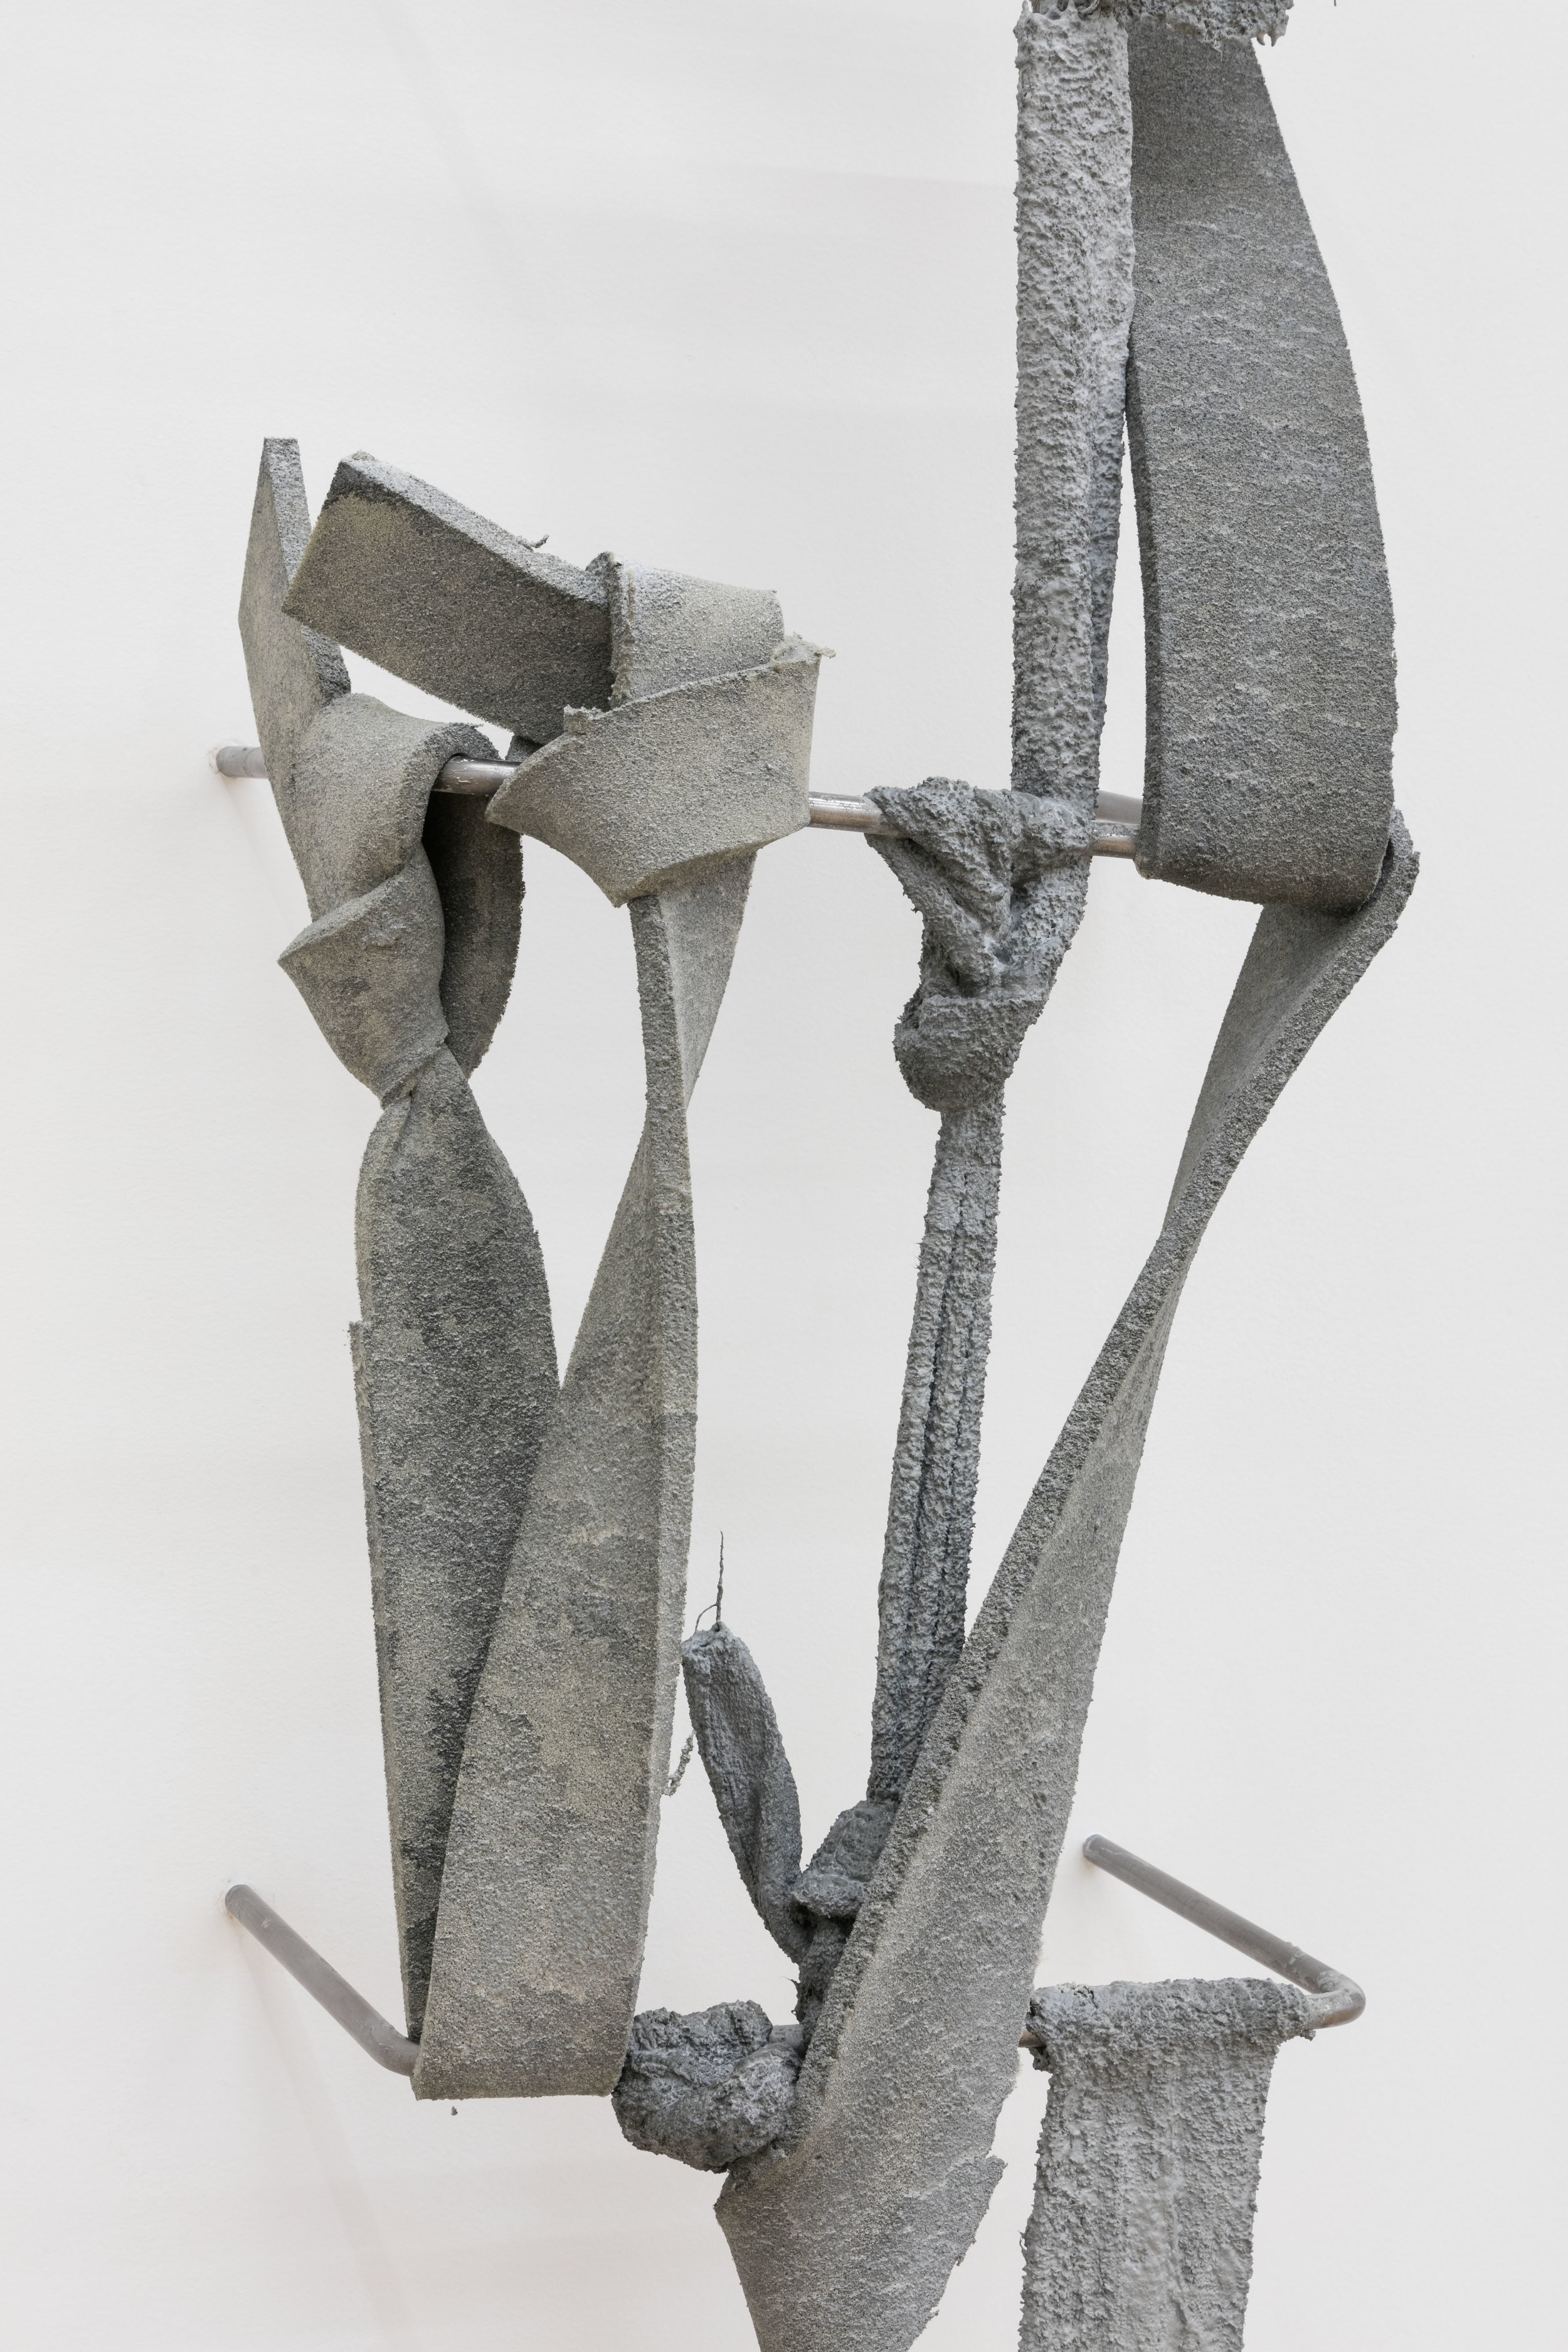 Nikita Gale,  FIXED LOOP IV  (detail), 2018, concrete, polyurethane foam, terrycloth, steel, 115 × 18 × 13 in.